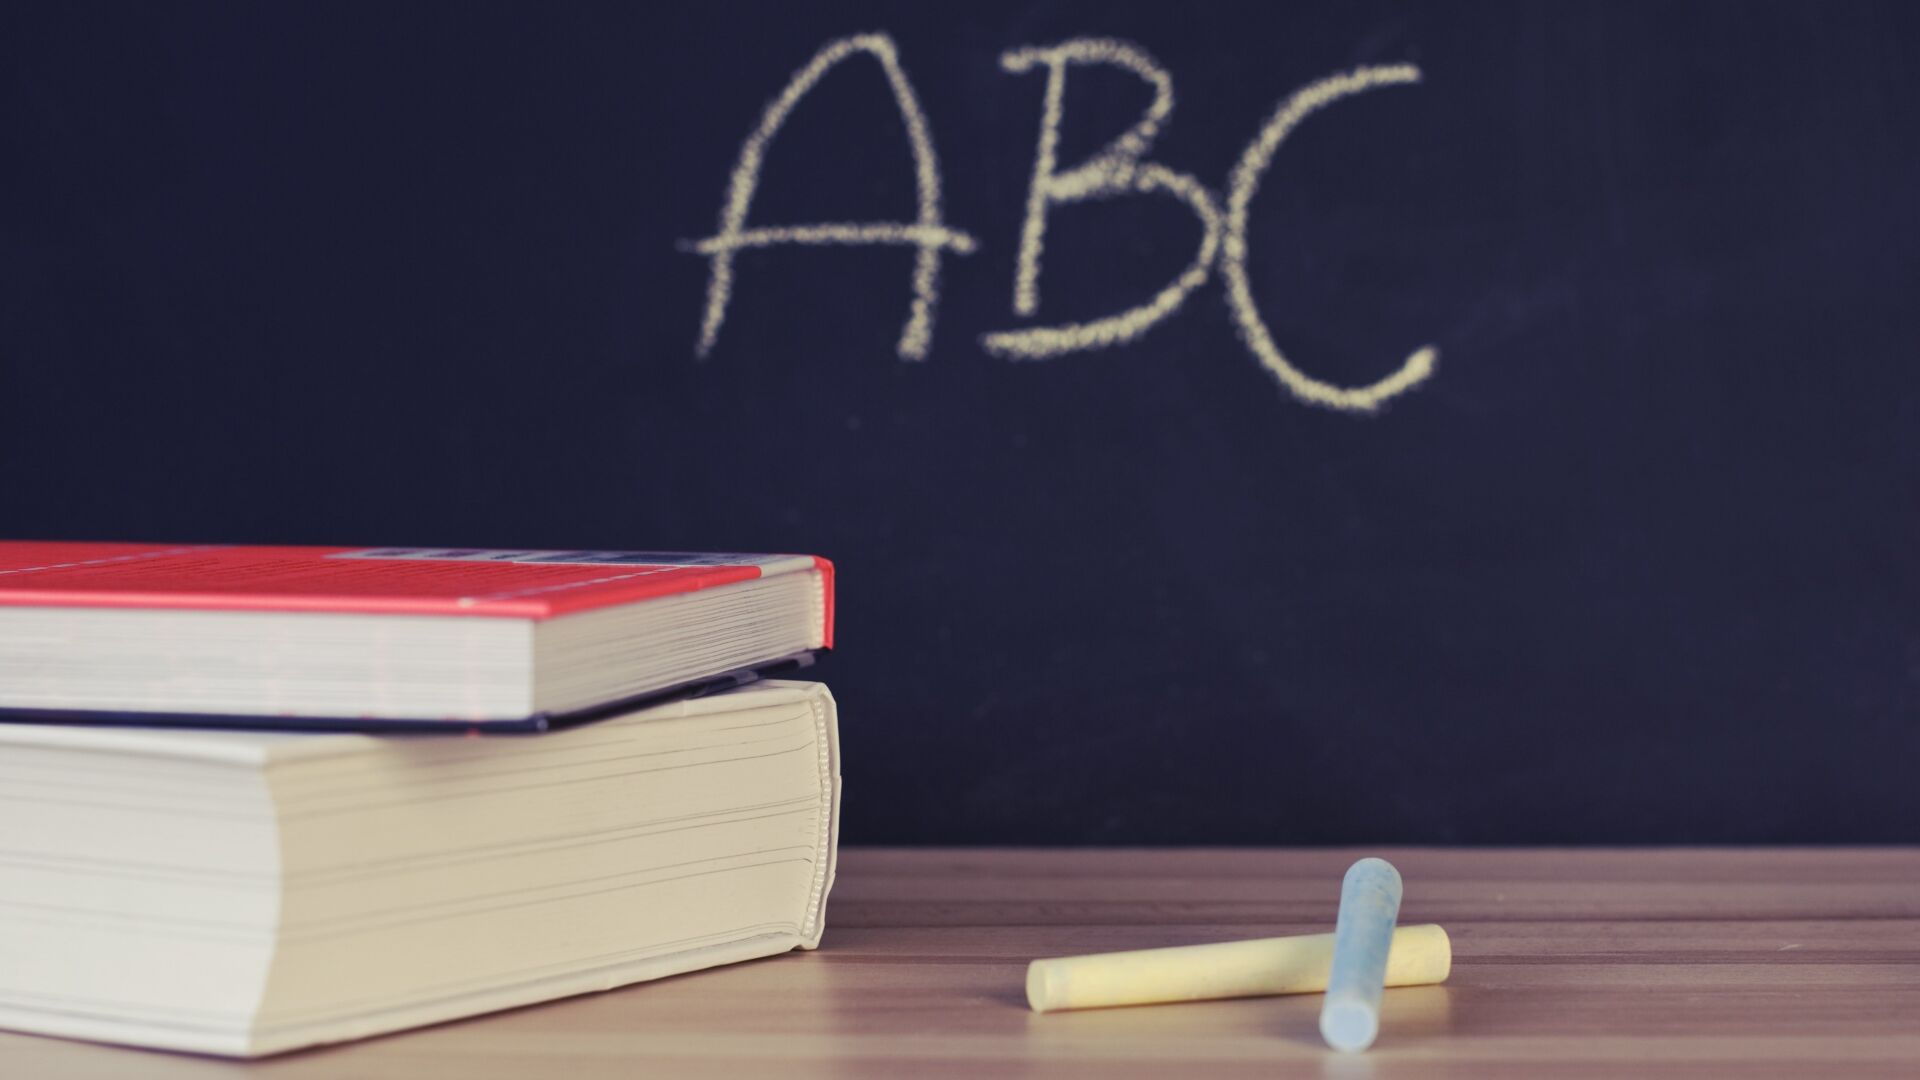 Abc books chalk chalkboard 265076